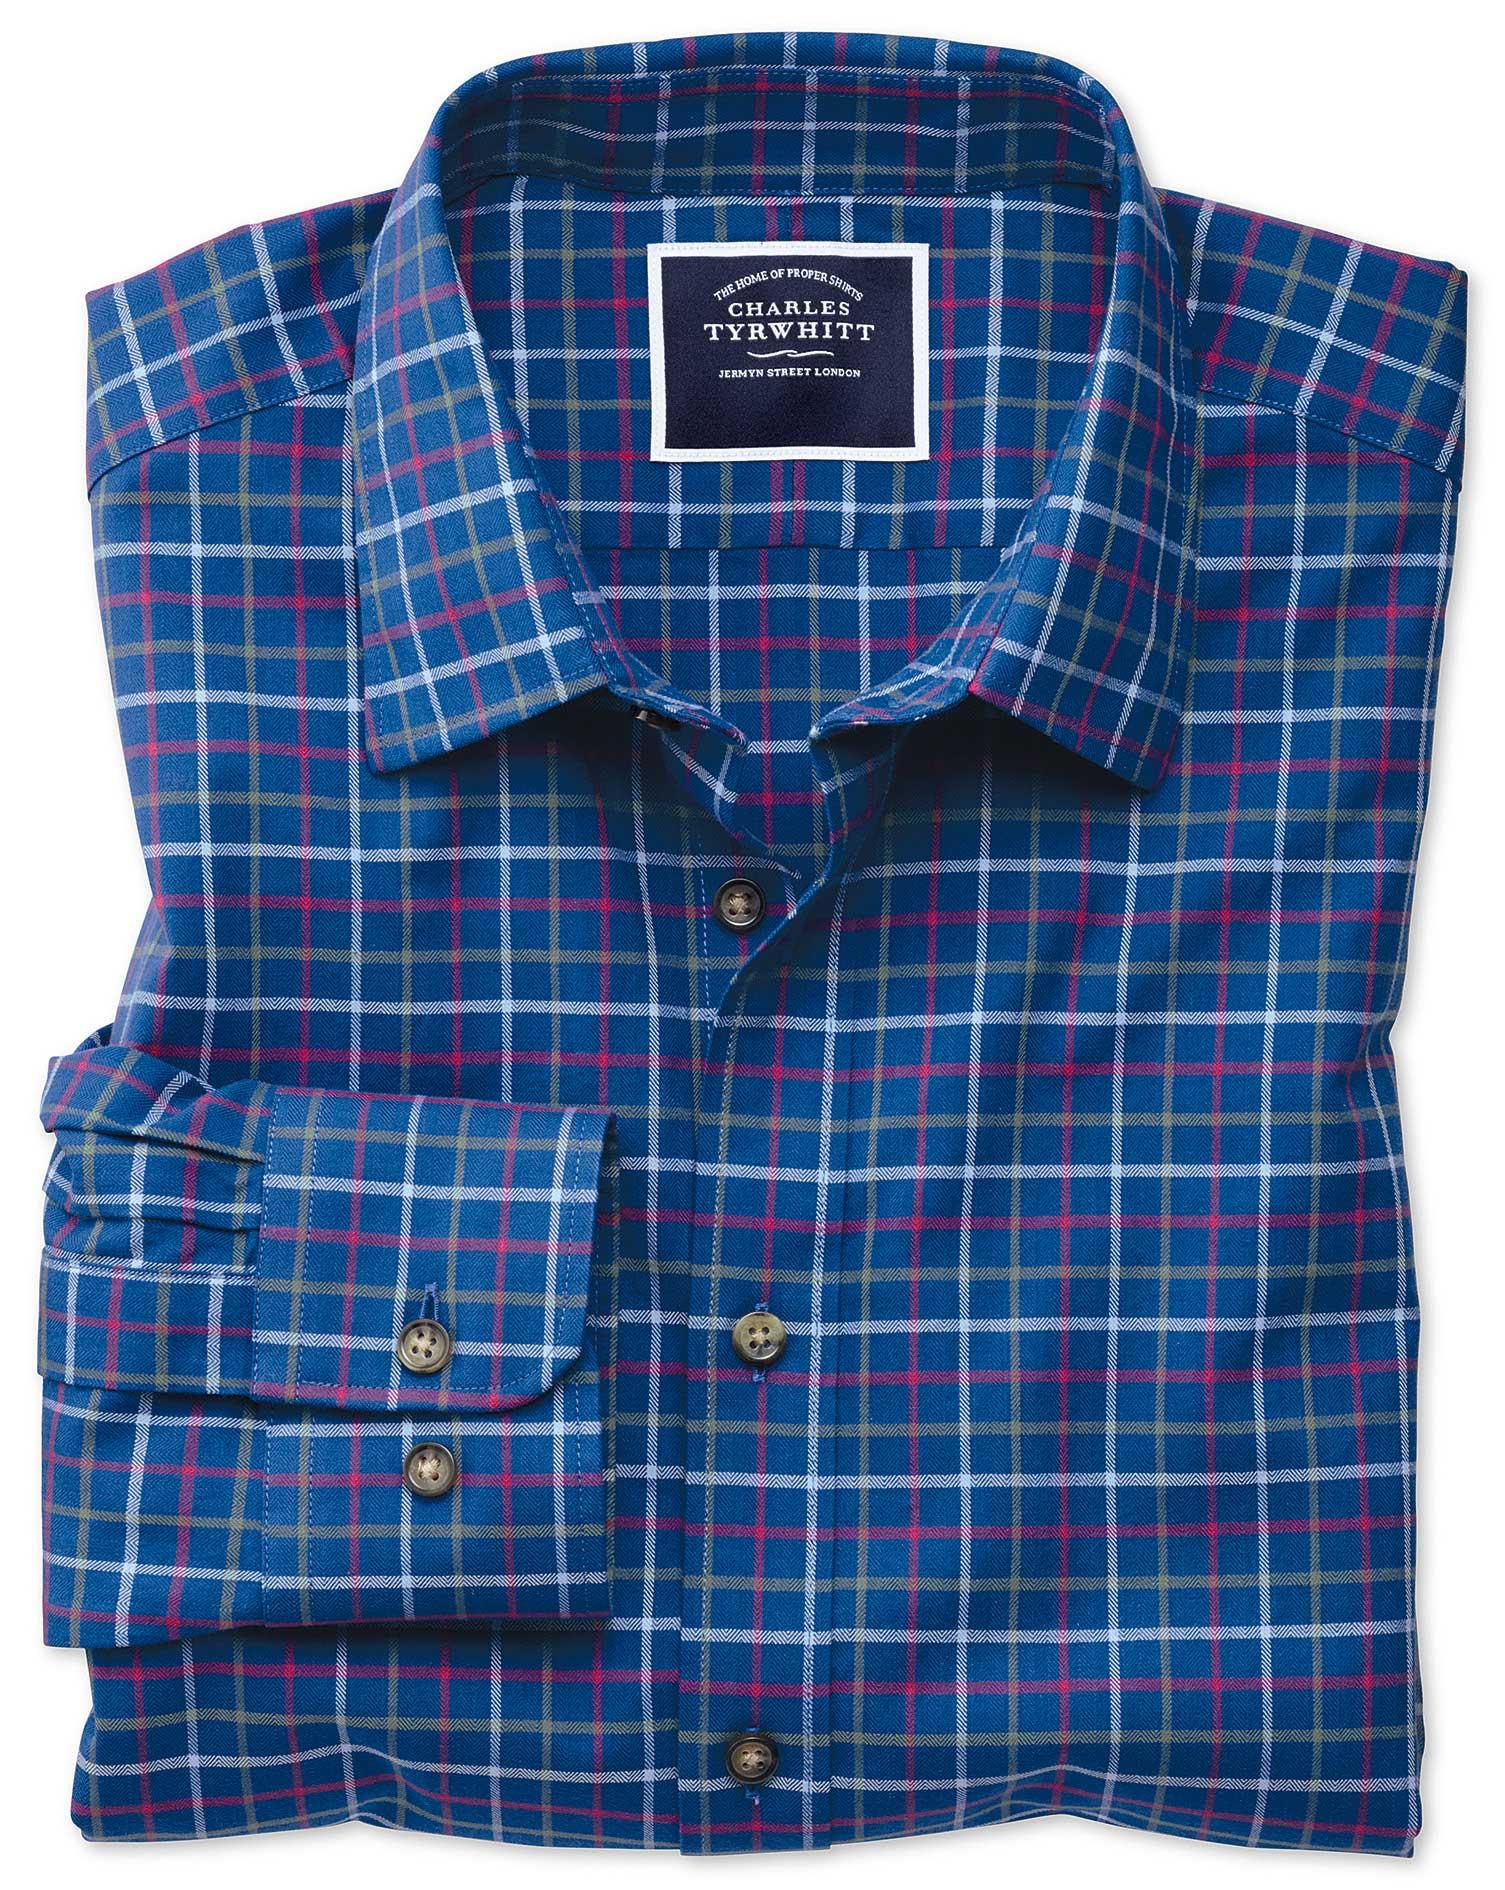 Slim Fit Blue Multi Brushed Check Cotton Shirt Single Cuff Size XXL by Charles Tyrwhitt